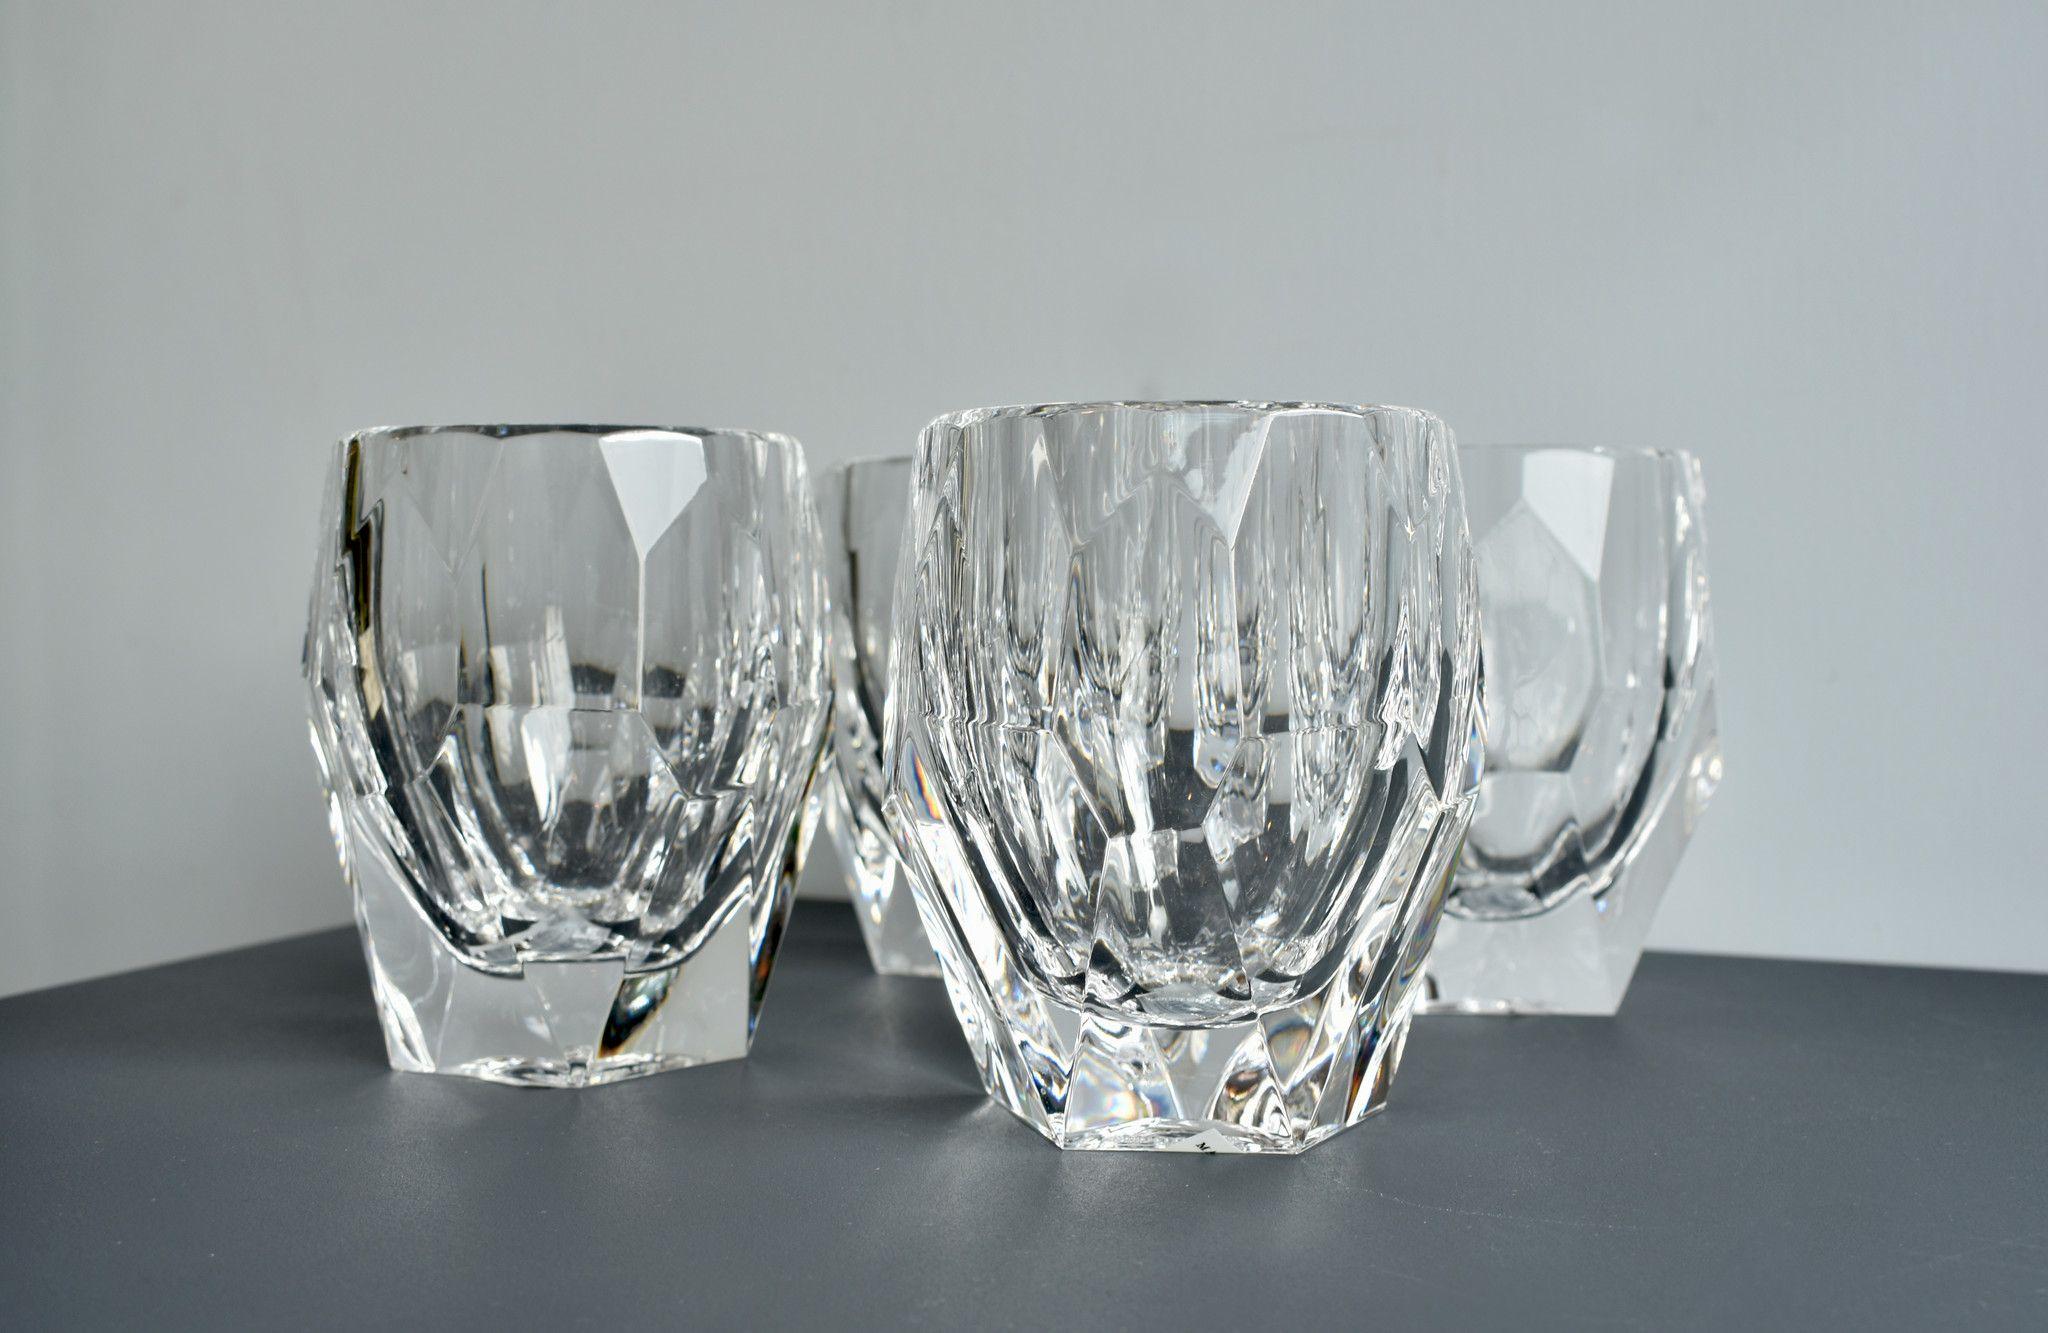 Bicchieri Super Milly - Mario Luca Giusti